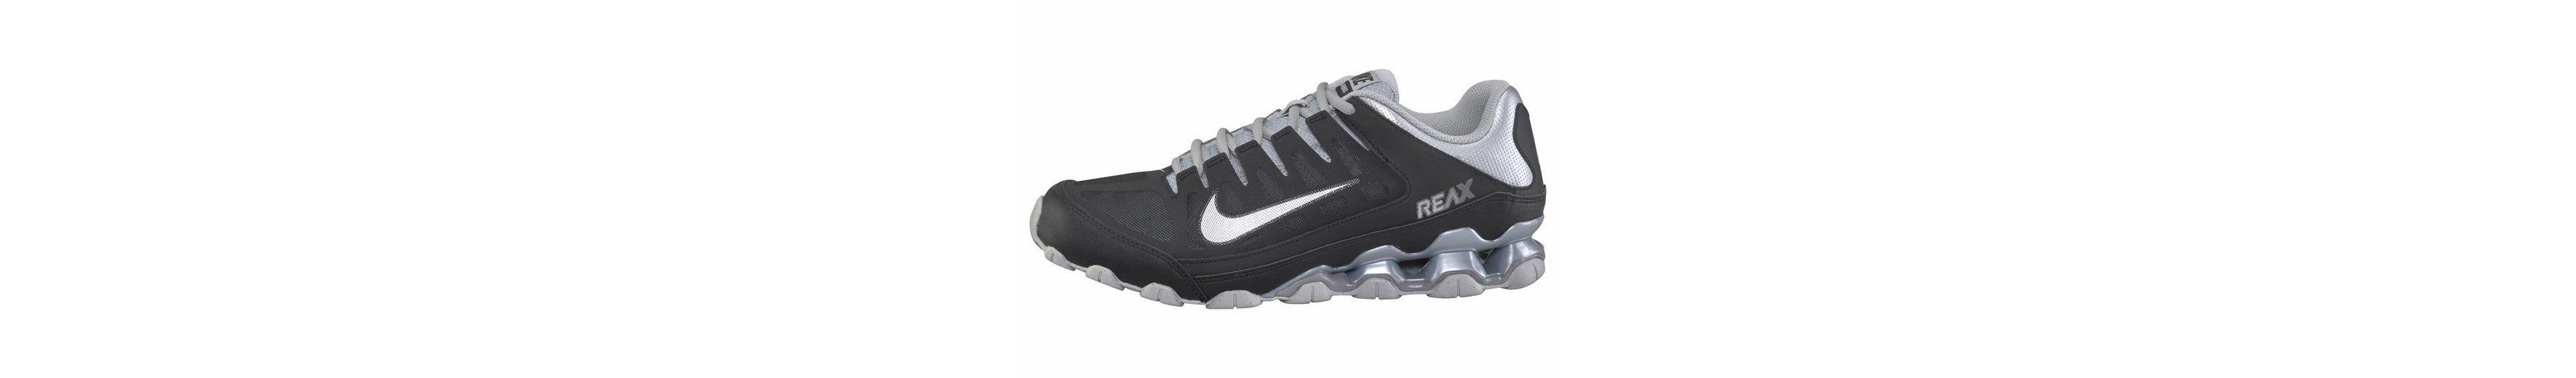 Nike Reax 8 Tr Mesh Trainingsschuh Countdown-Paket OXdUmYtQW7